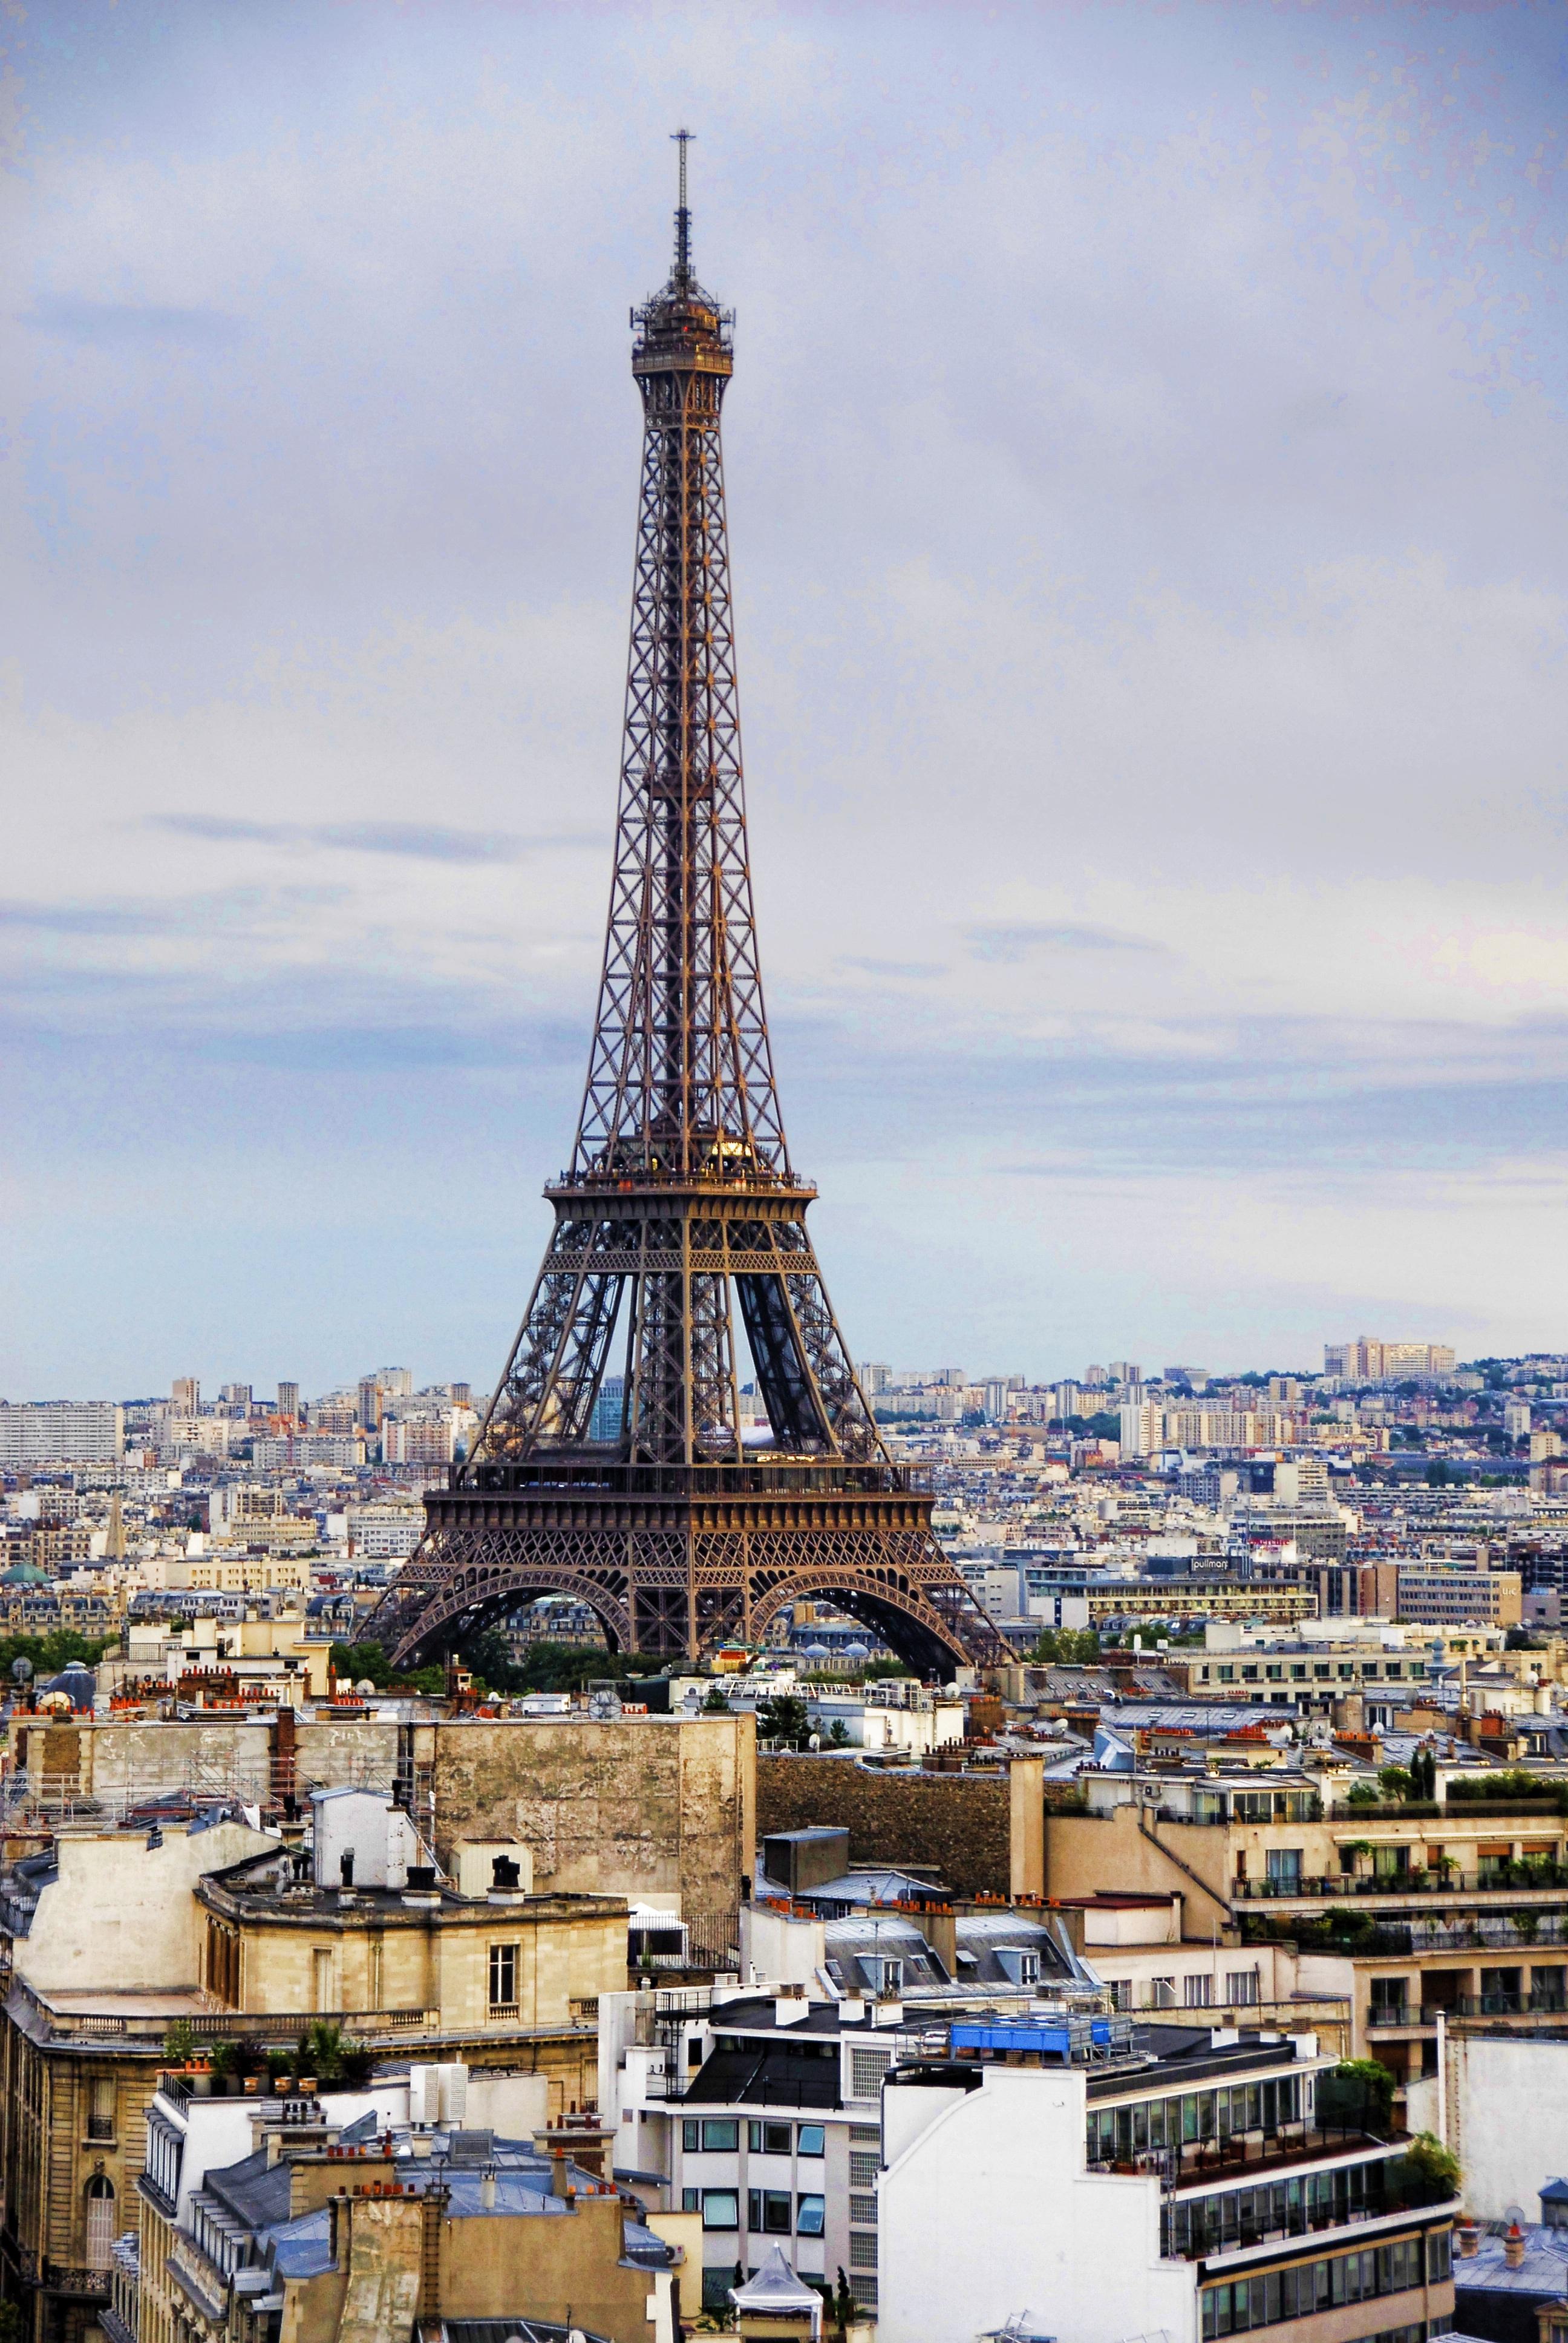 Teen Girl Hd Wallpaper Eiffel Tower During Daytime 183 Free Stock Photo